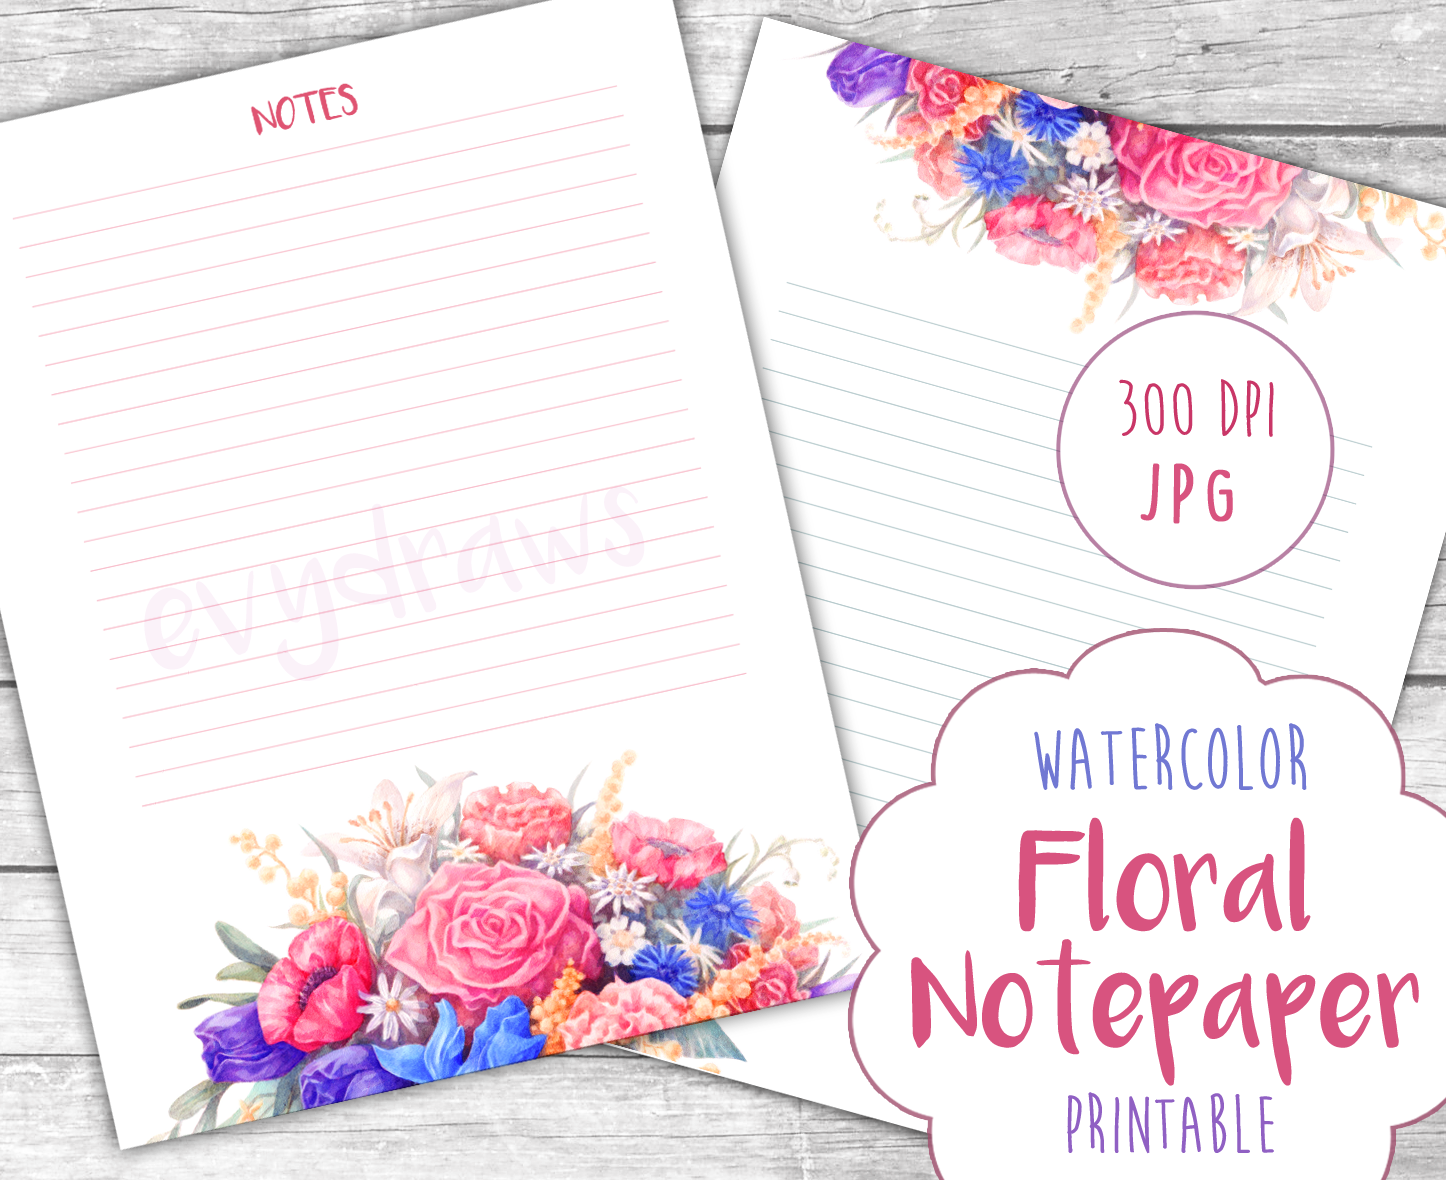 floral-notepaper-printable.PNG